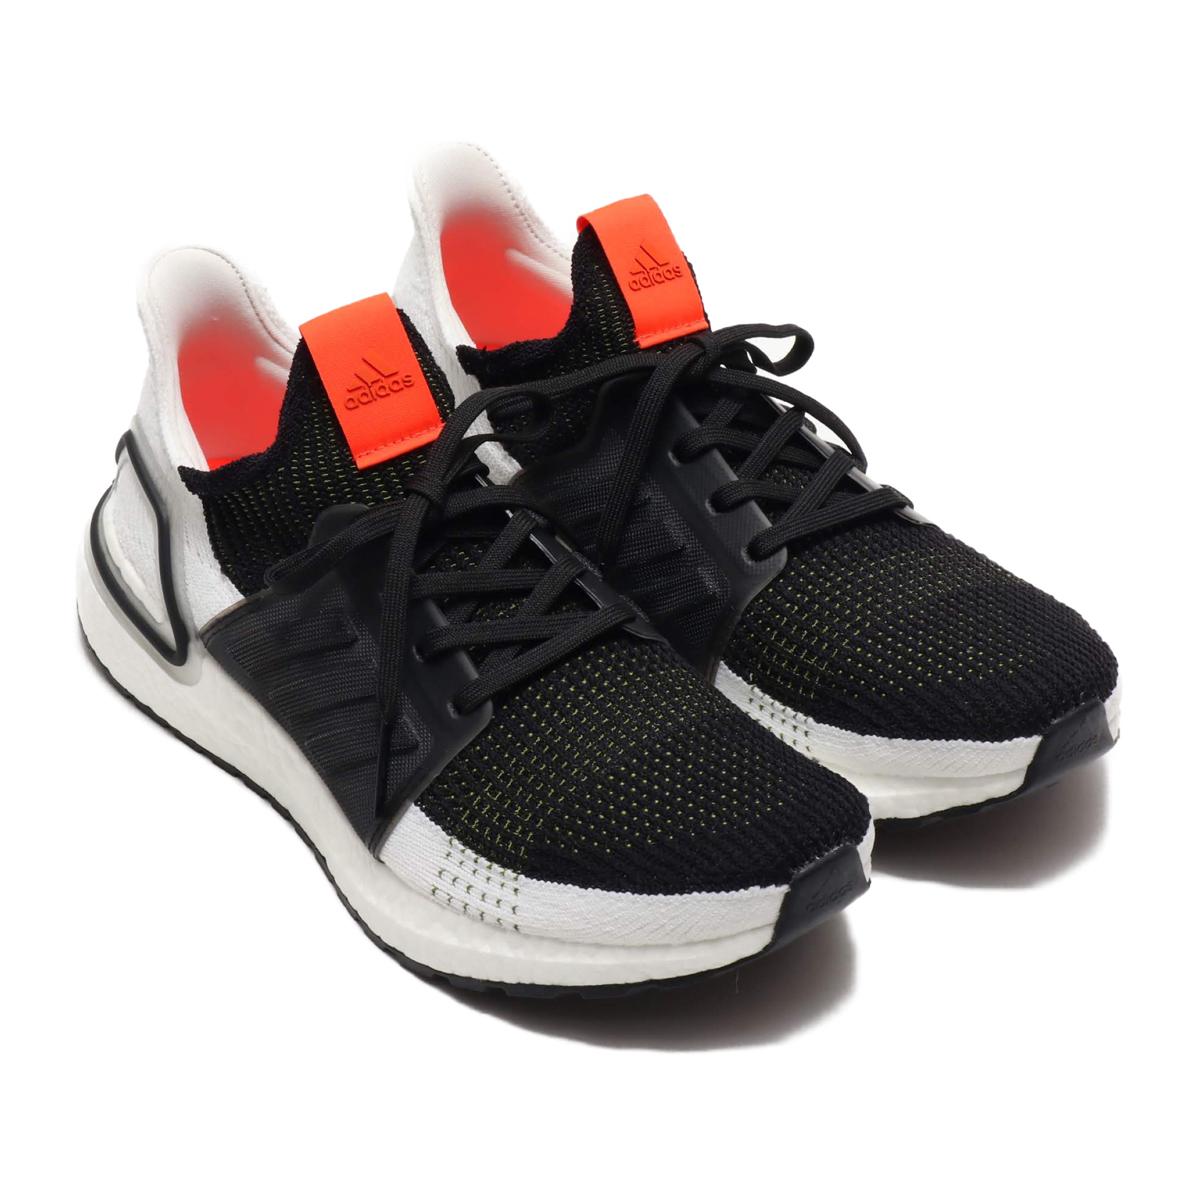 adidas ultra boost black gold, Adidas combat speed 4 iv